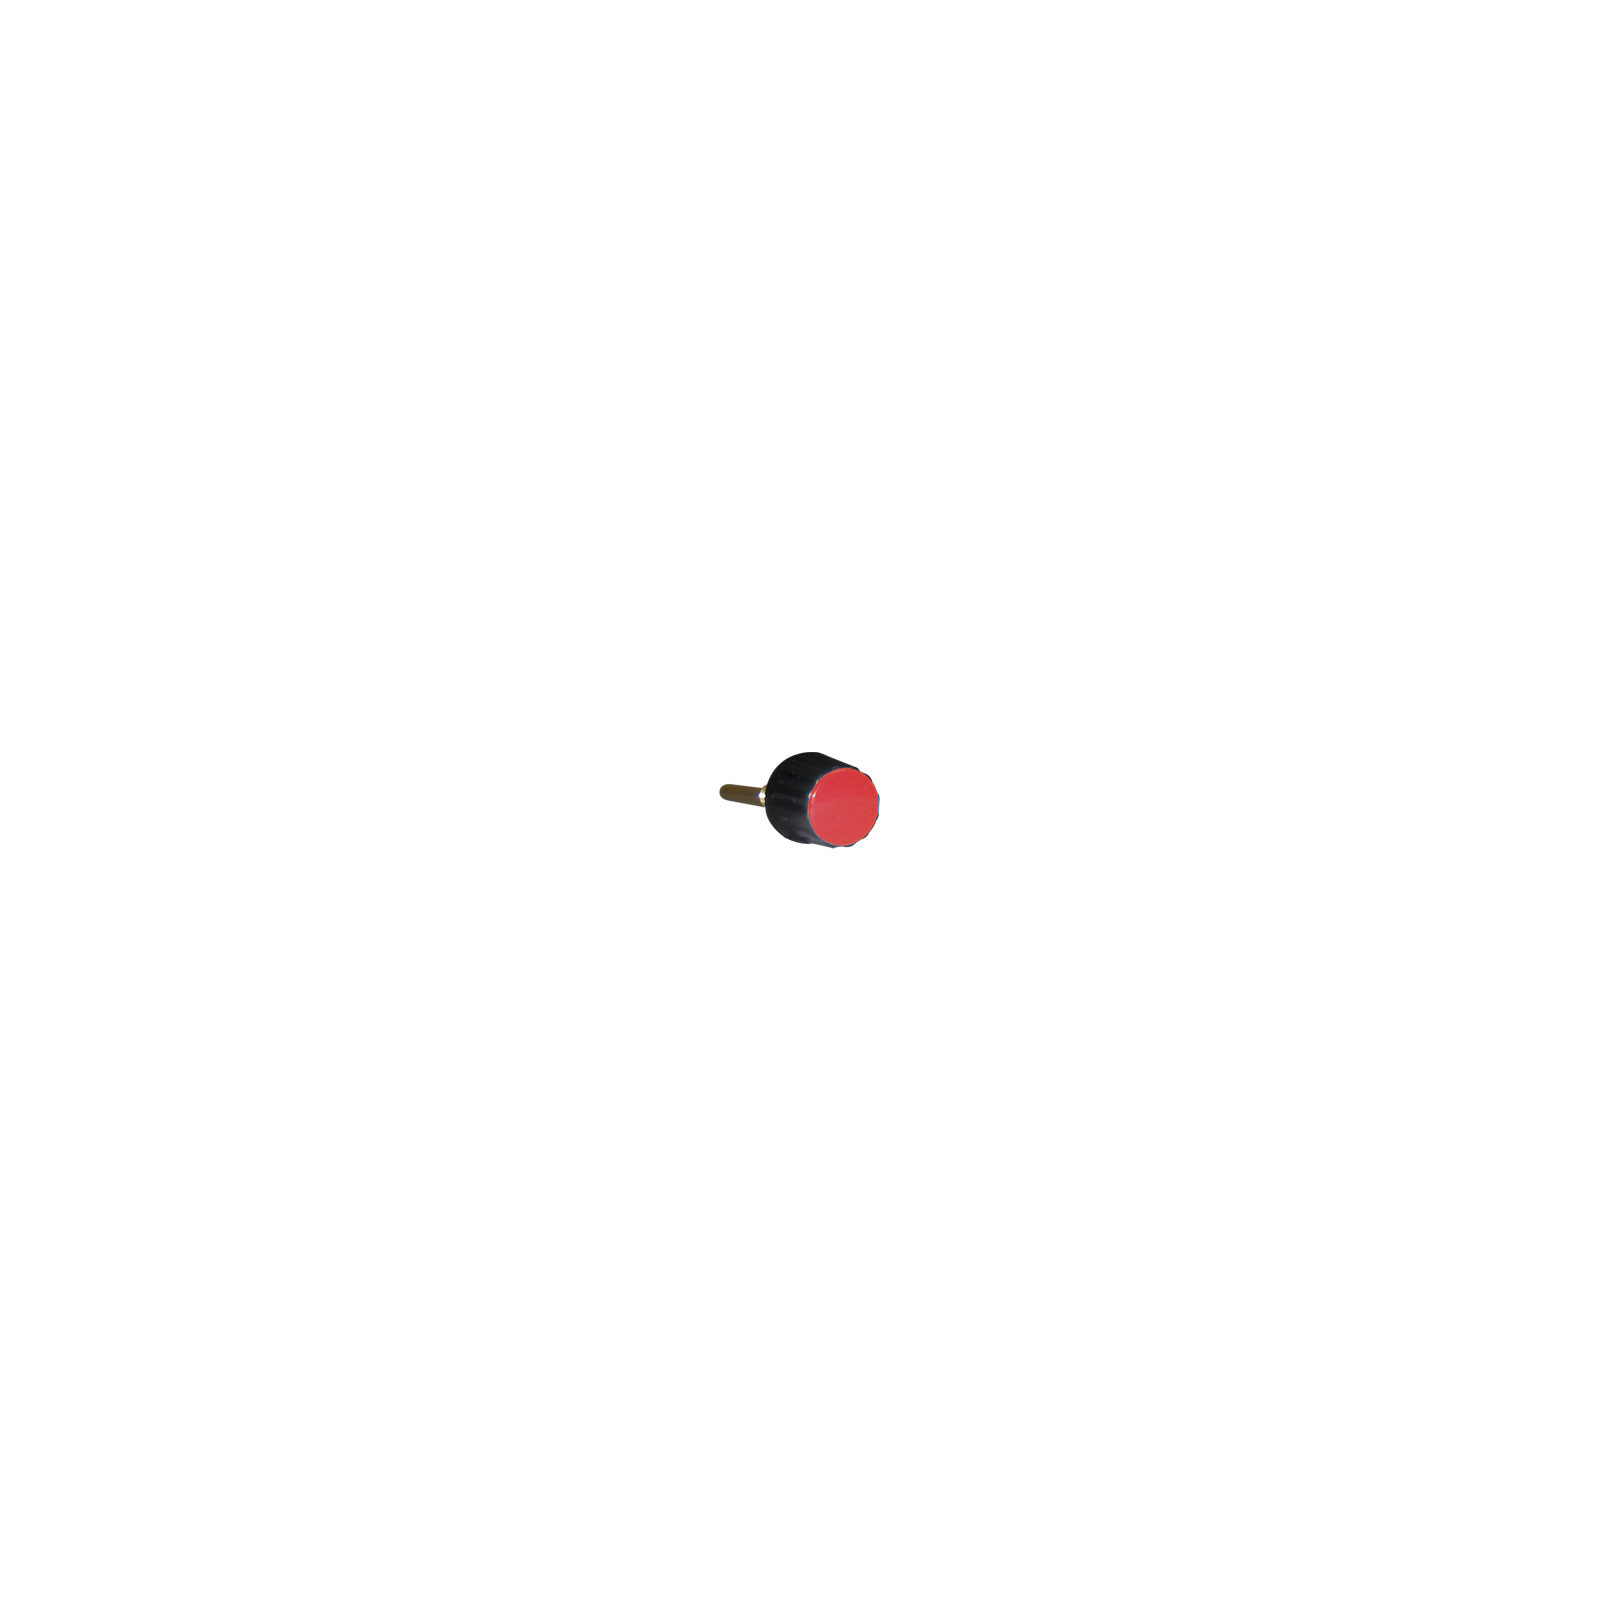 Robinet pour chalumeau Charledave Jetsoud OT Acétylène - A290370